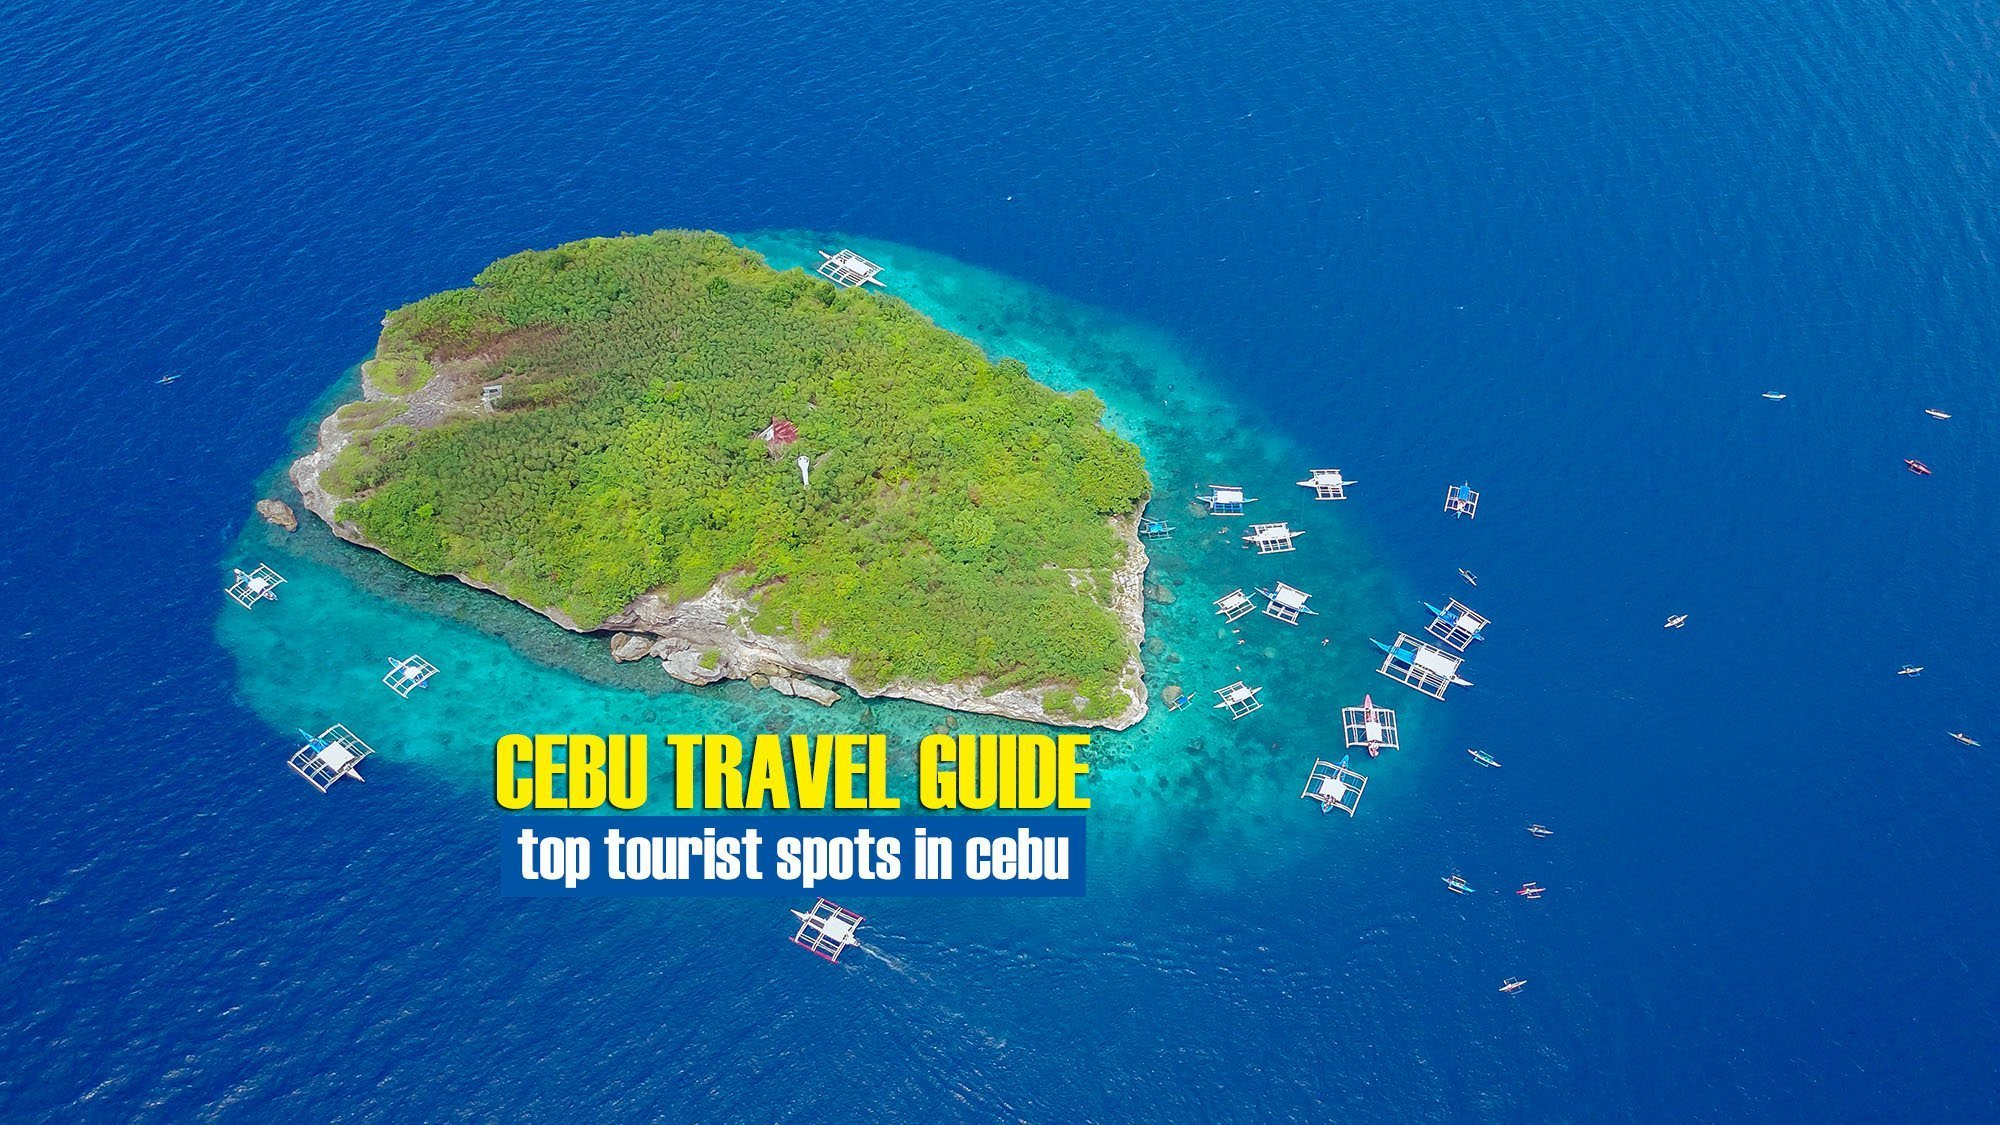 11 Tourist Spots in Cebu Province